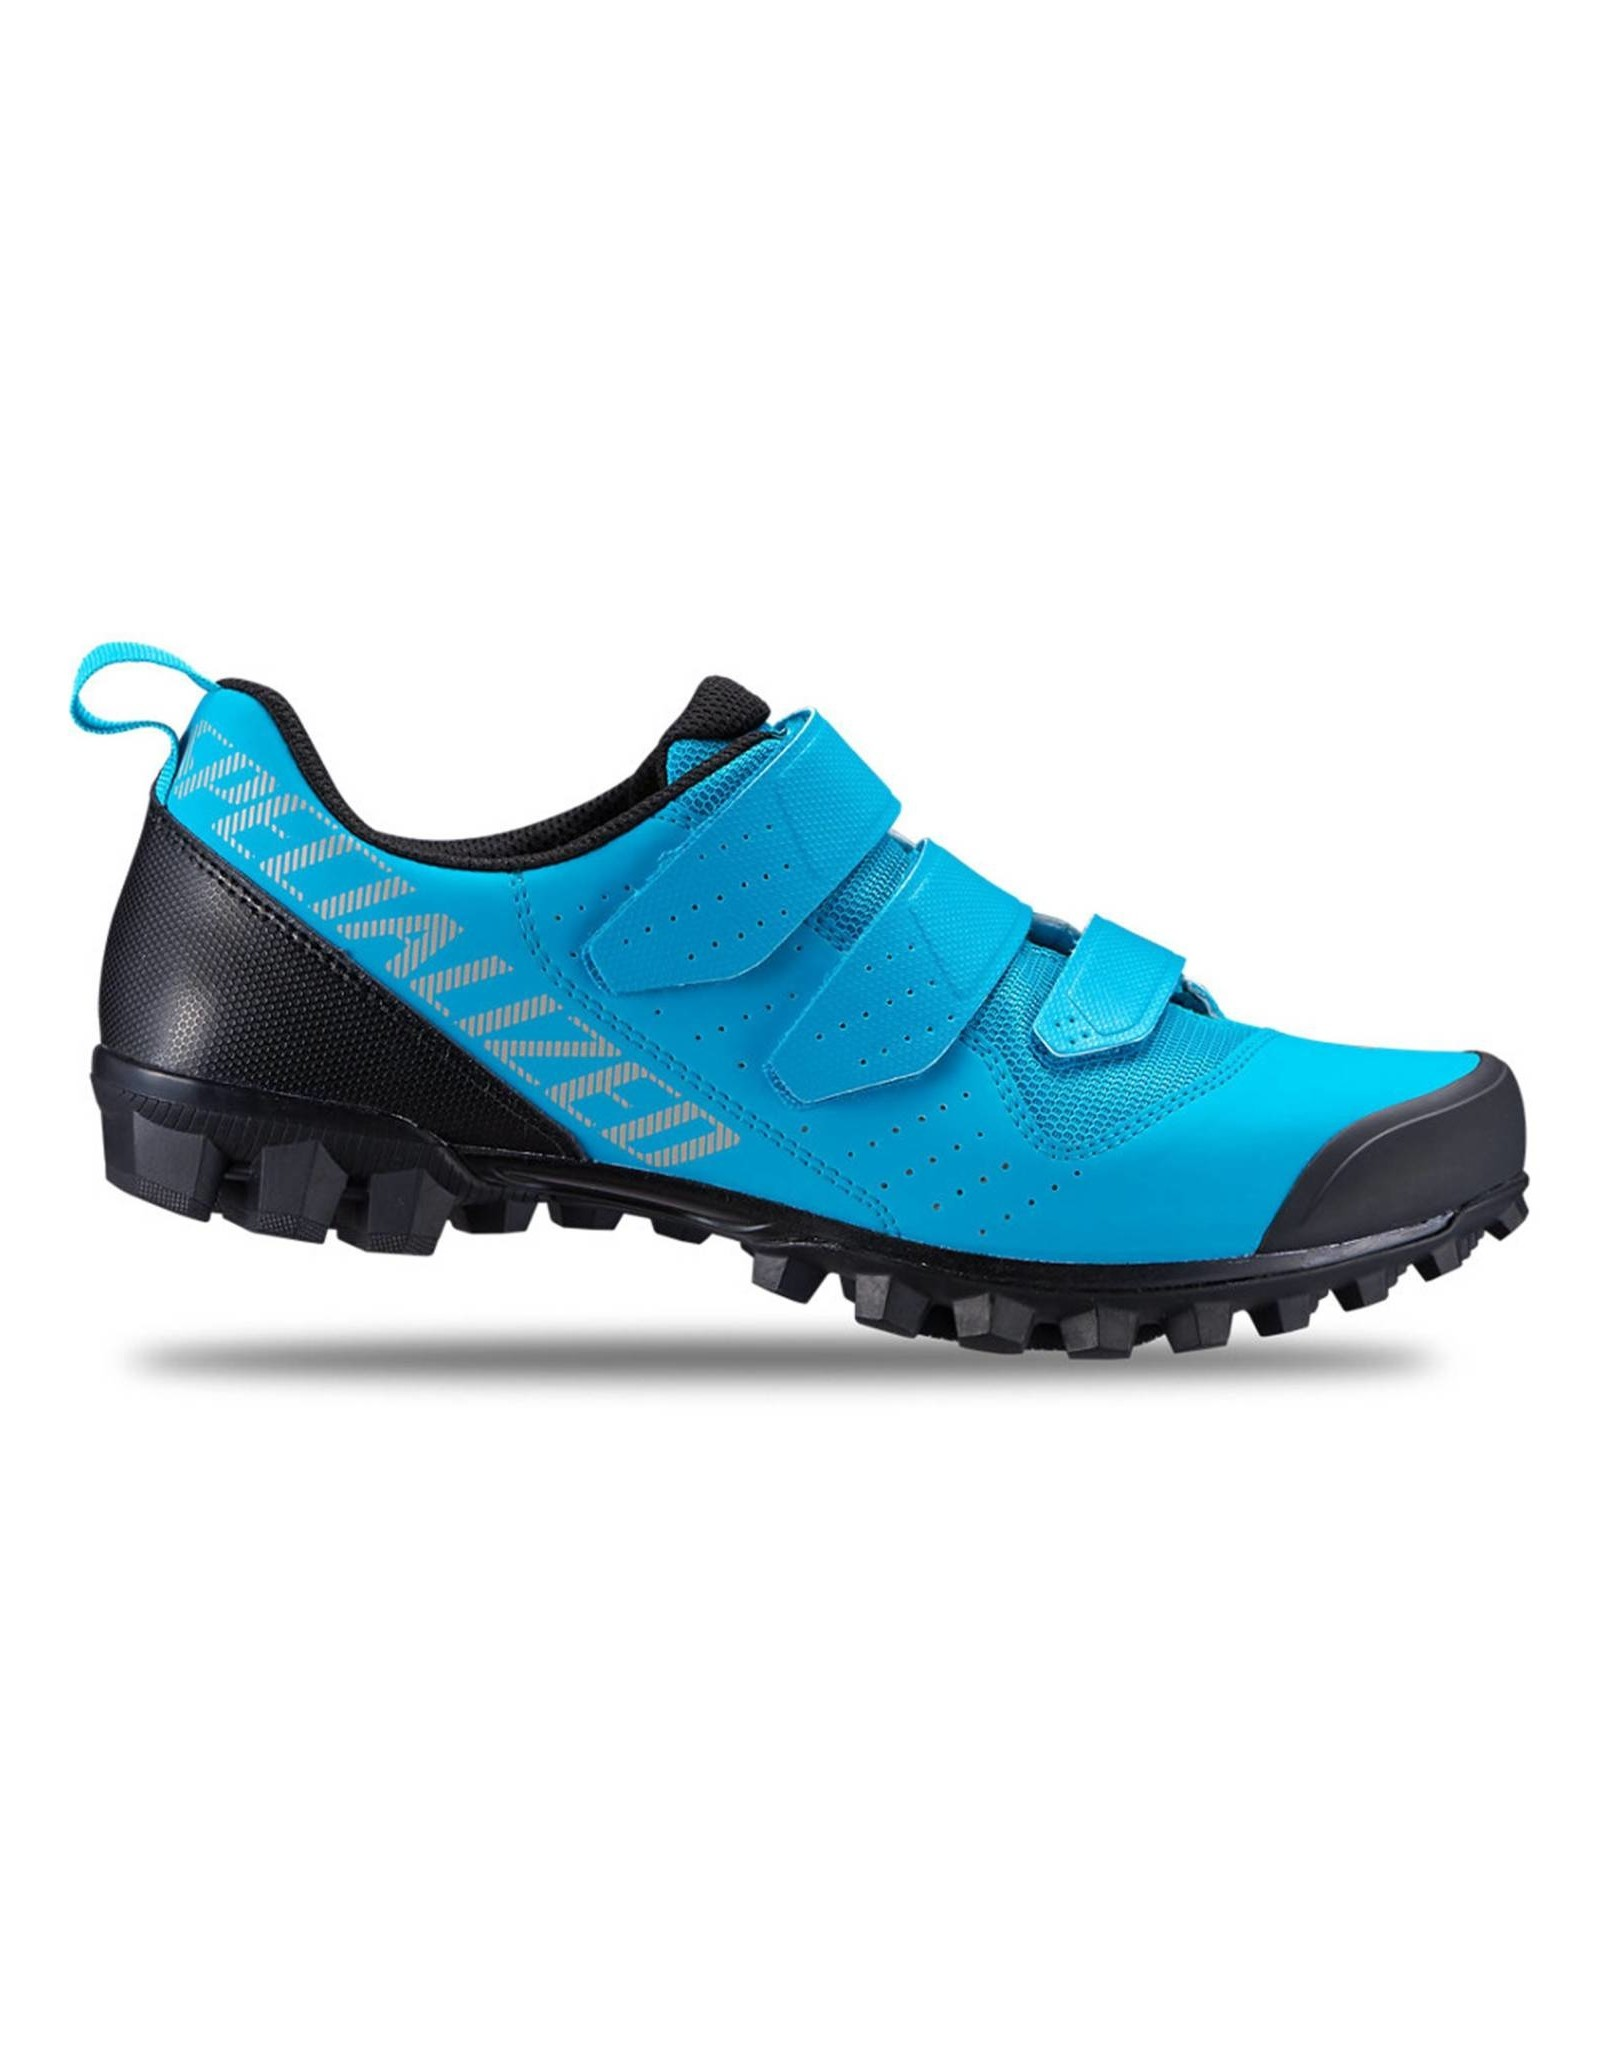 SPECIALIZED Specialized Recon 1.0 MTB Shoe Aqua